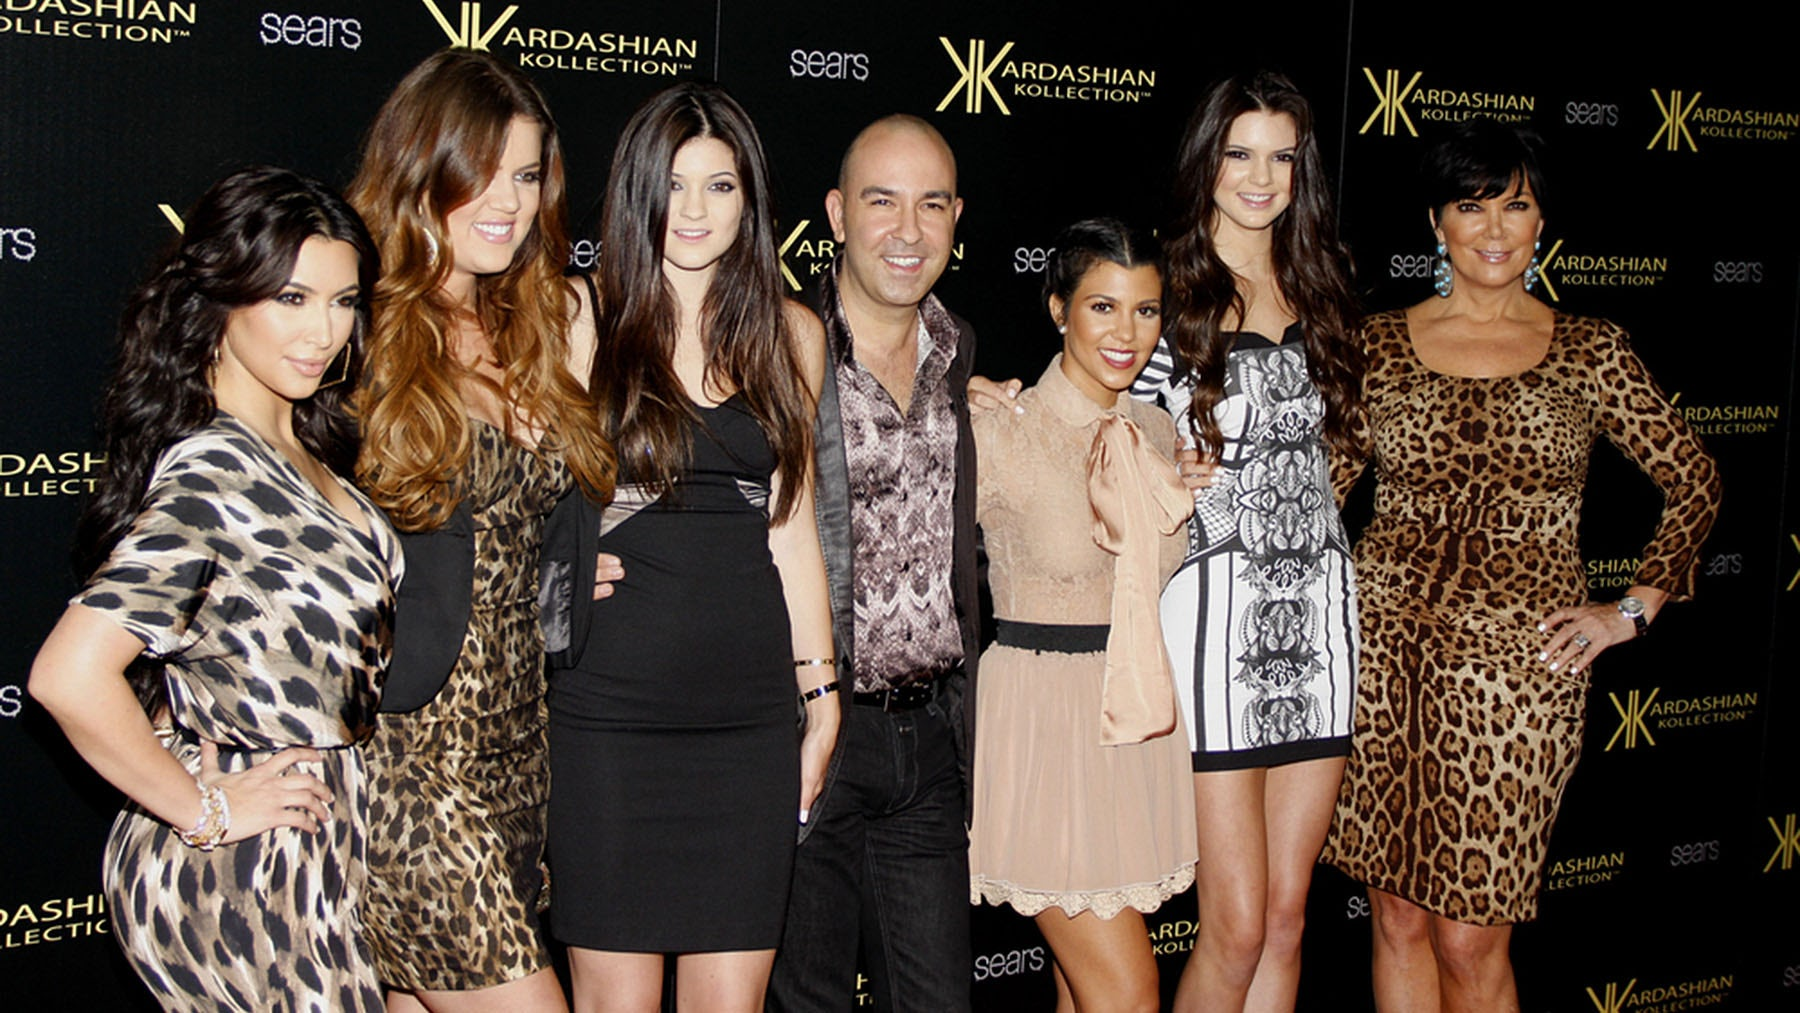 The Kardashians promote the Kardashian Kollection | Source: Shutterstock